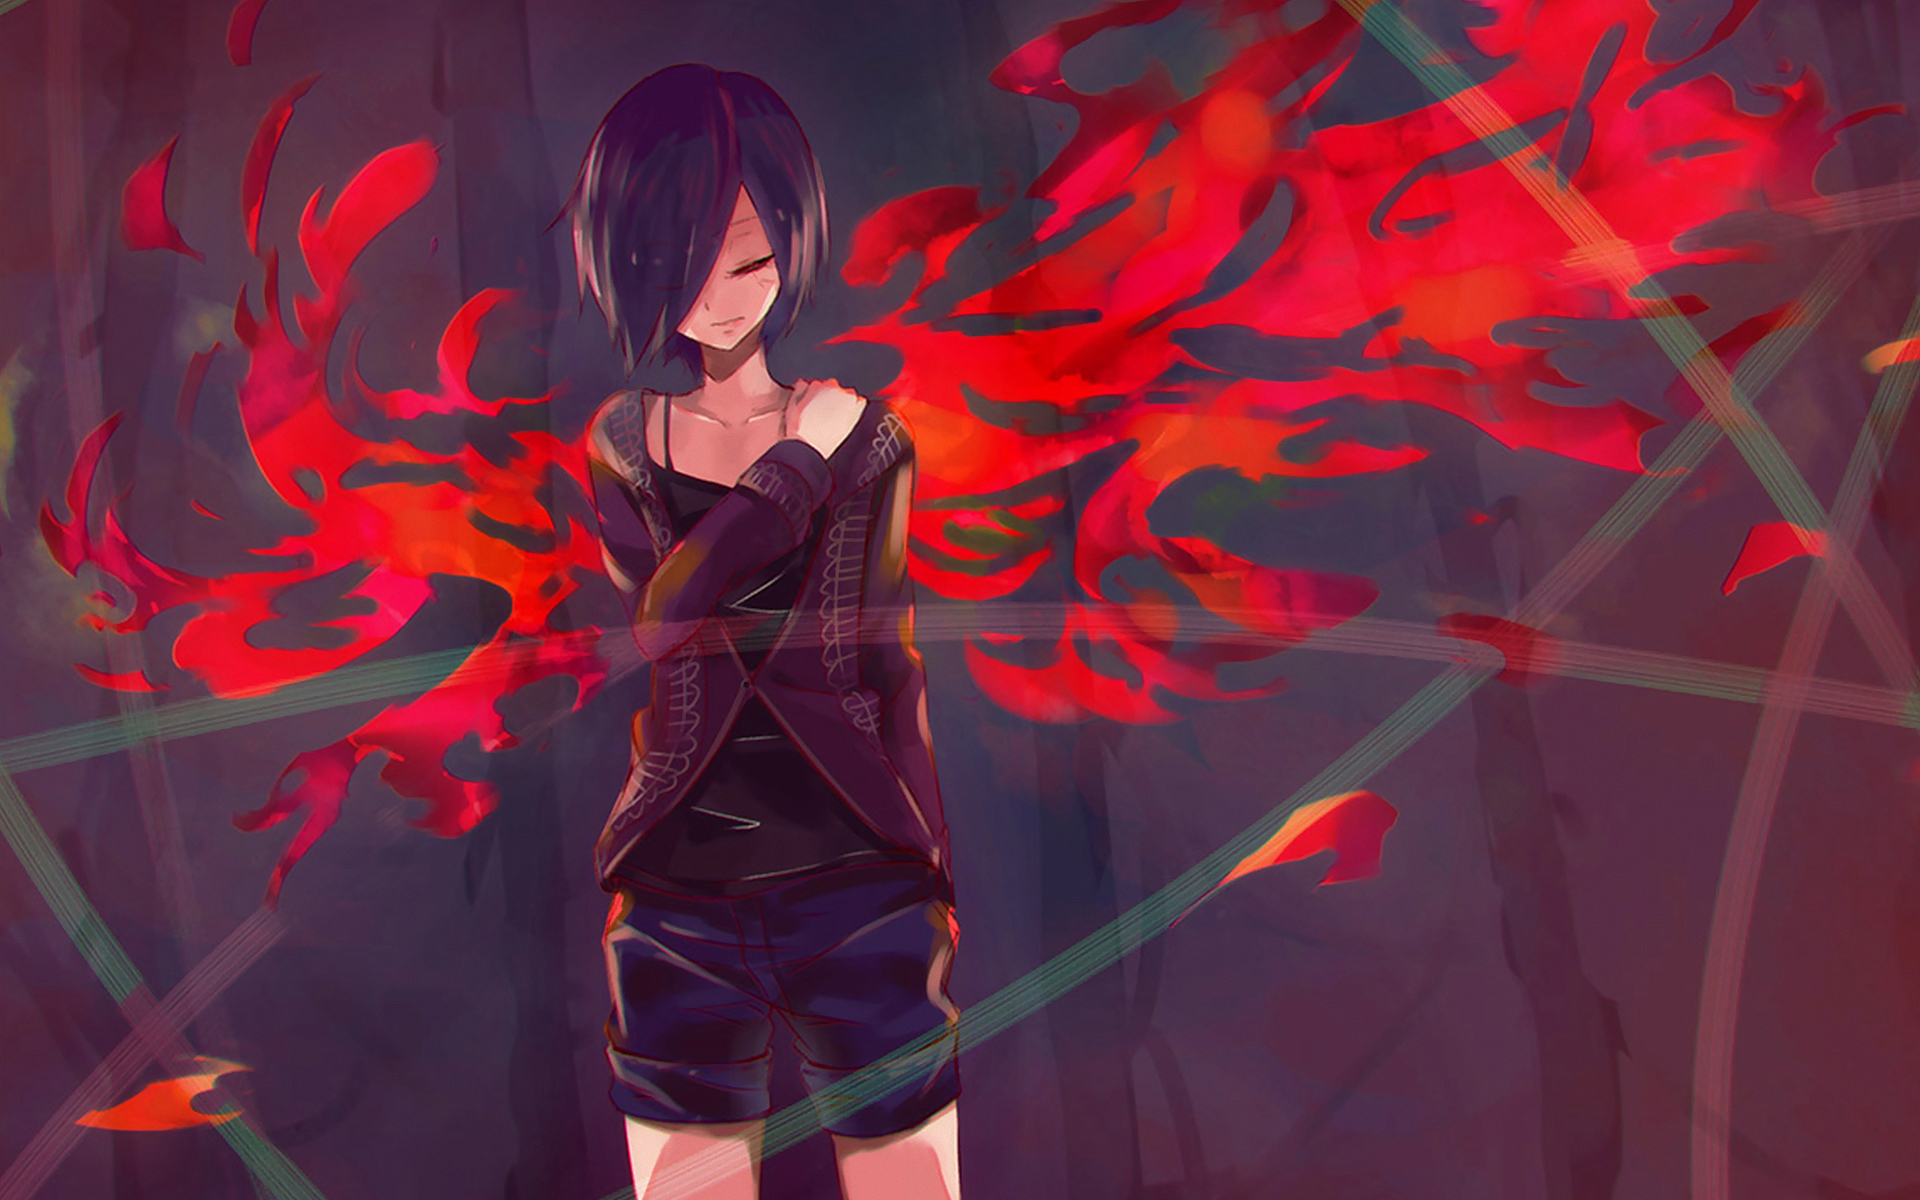 Anime, art, tokyo ghoul, токийский гуль, kirishima touka ...: goodfon.ru/wallpaper/anime-art-tokyo-ghoul-867.html